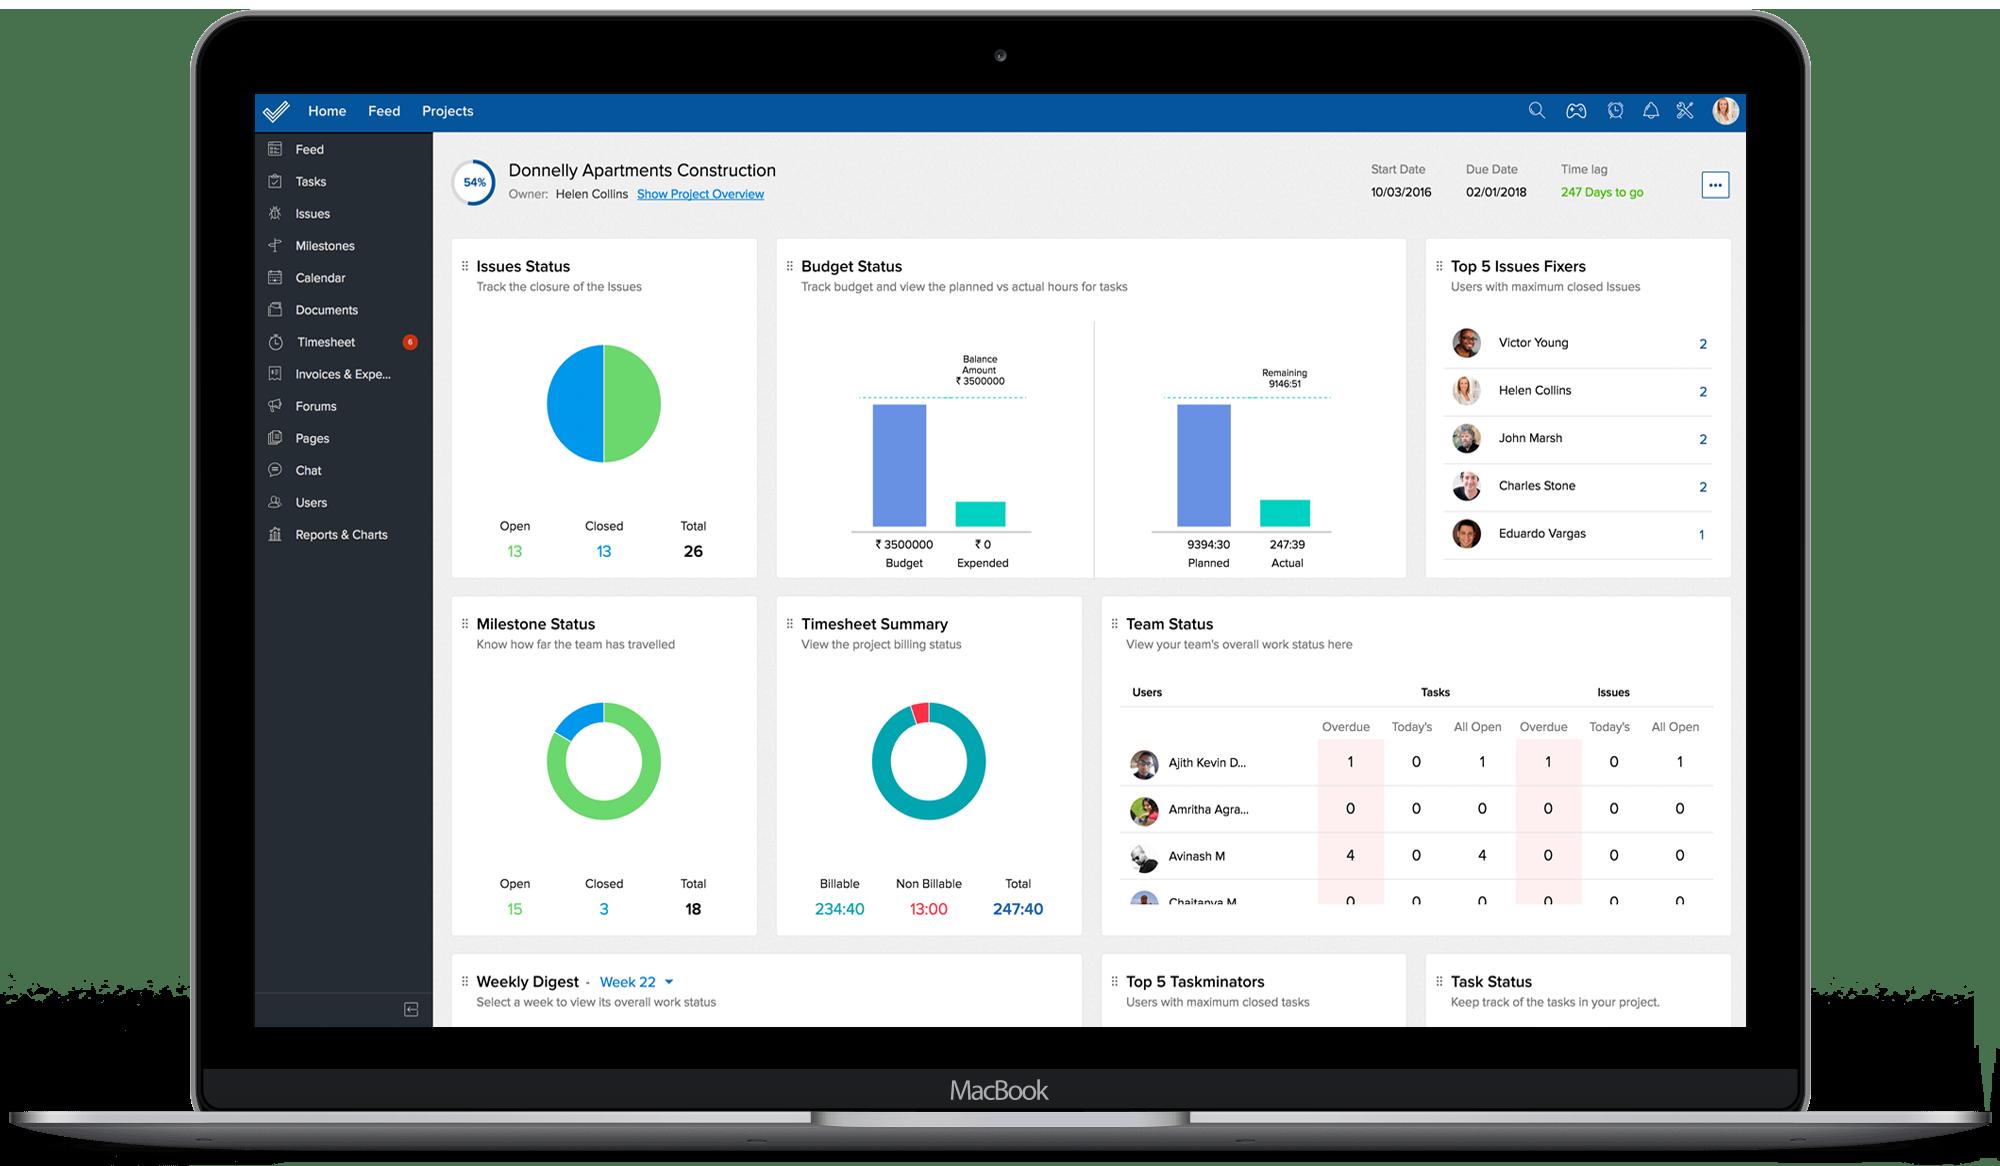 Sviluppo software aziendale con sharepoint microsoft